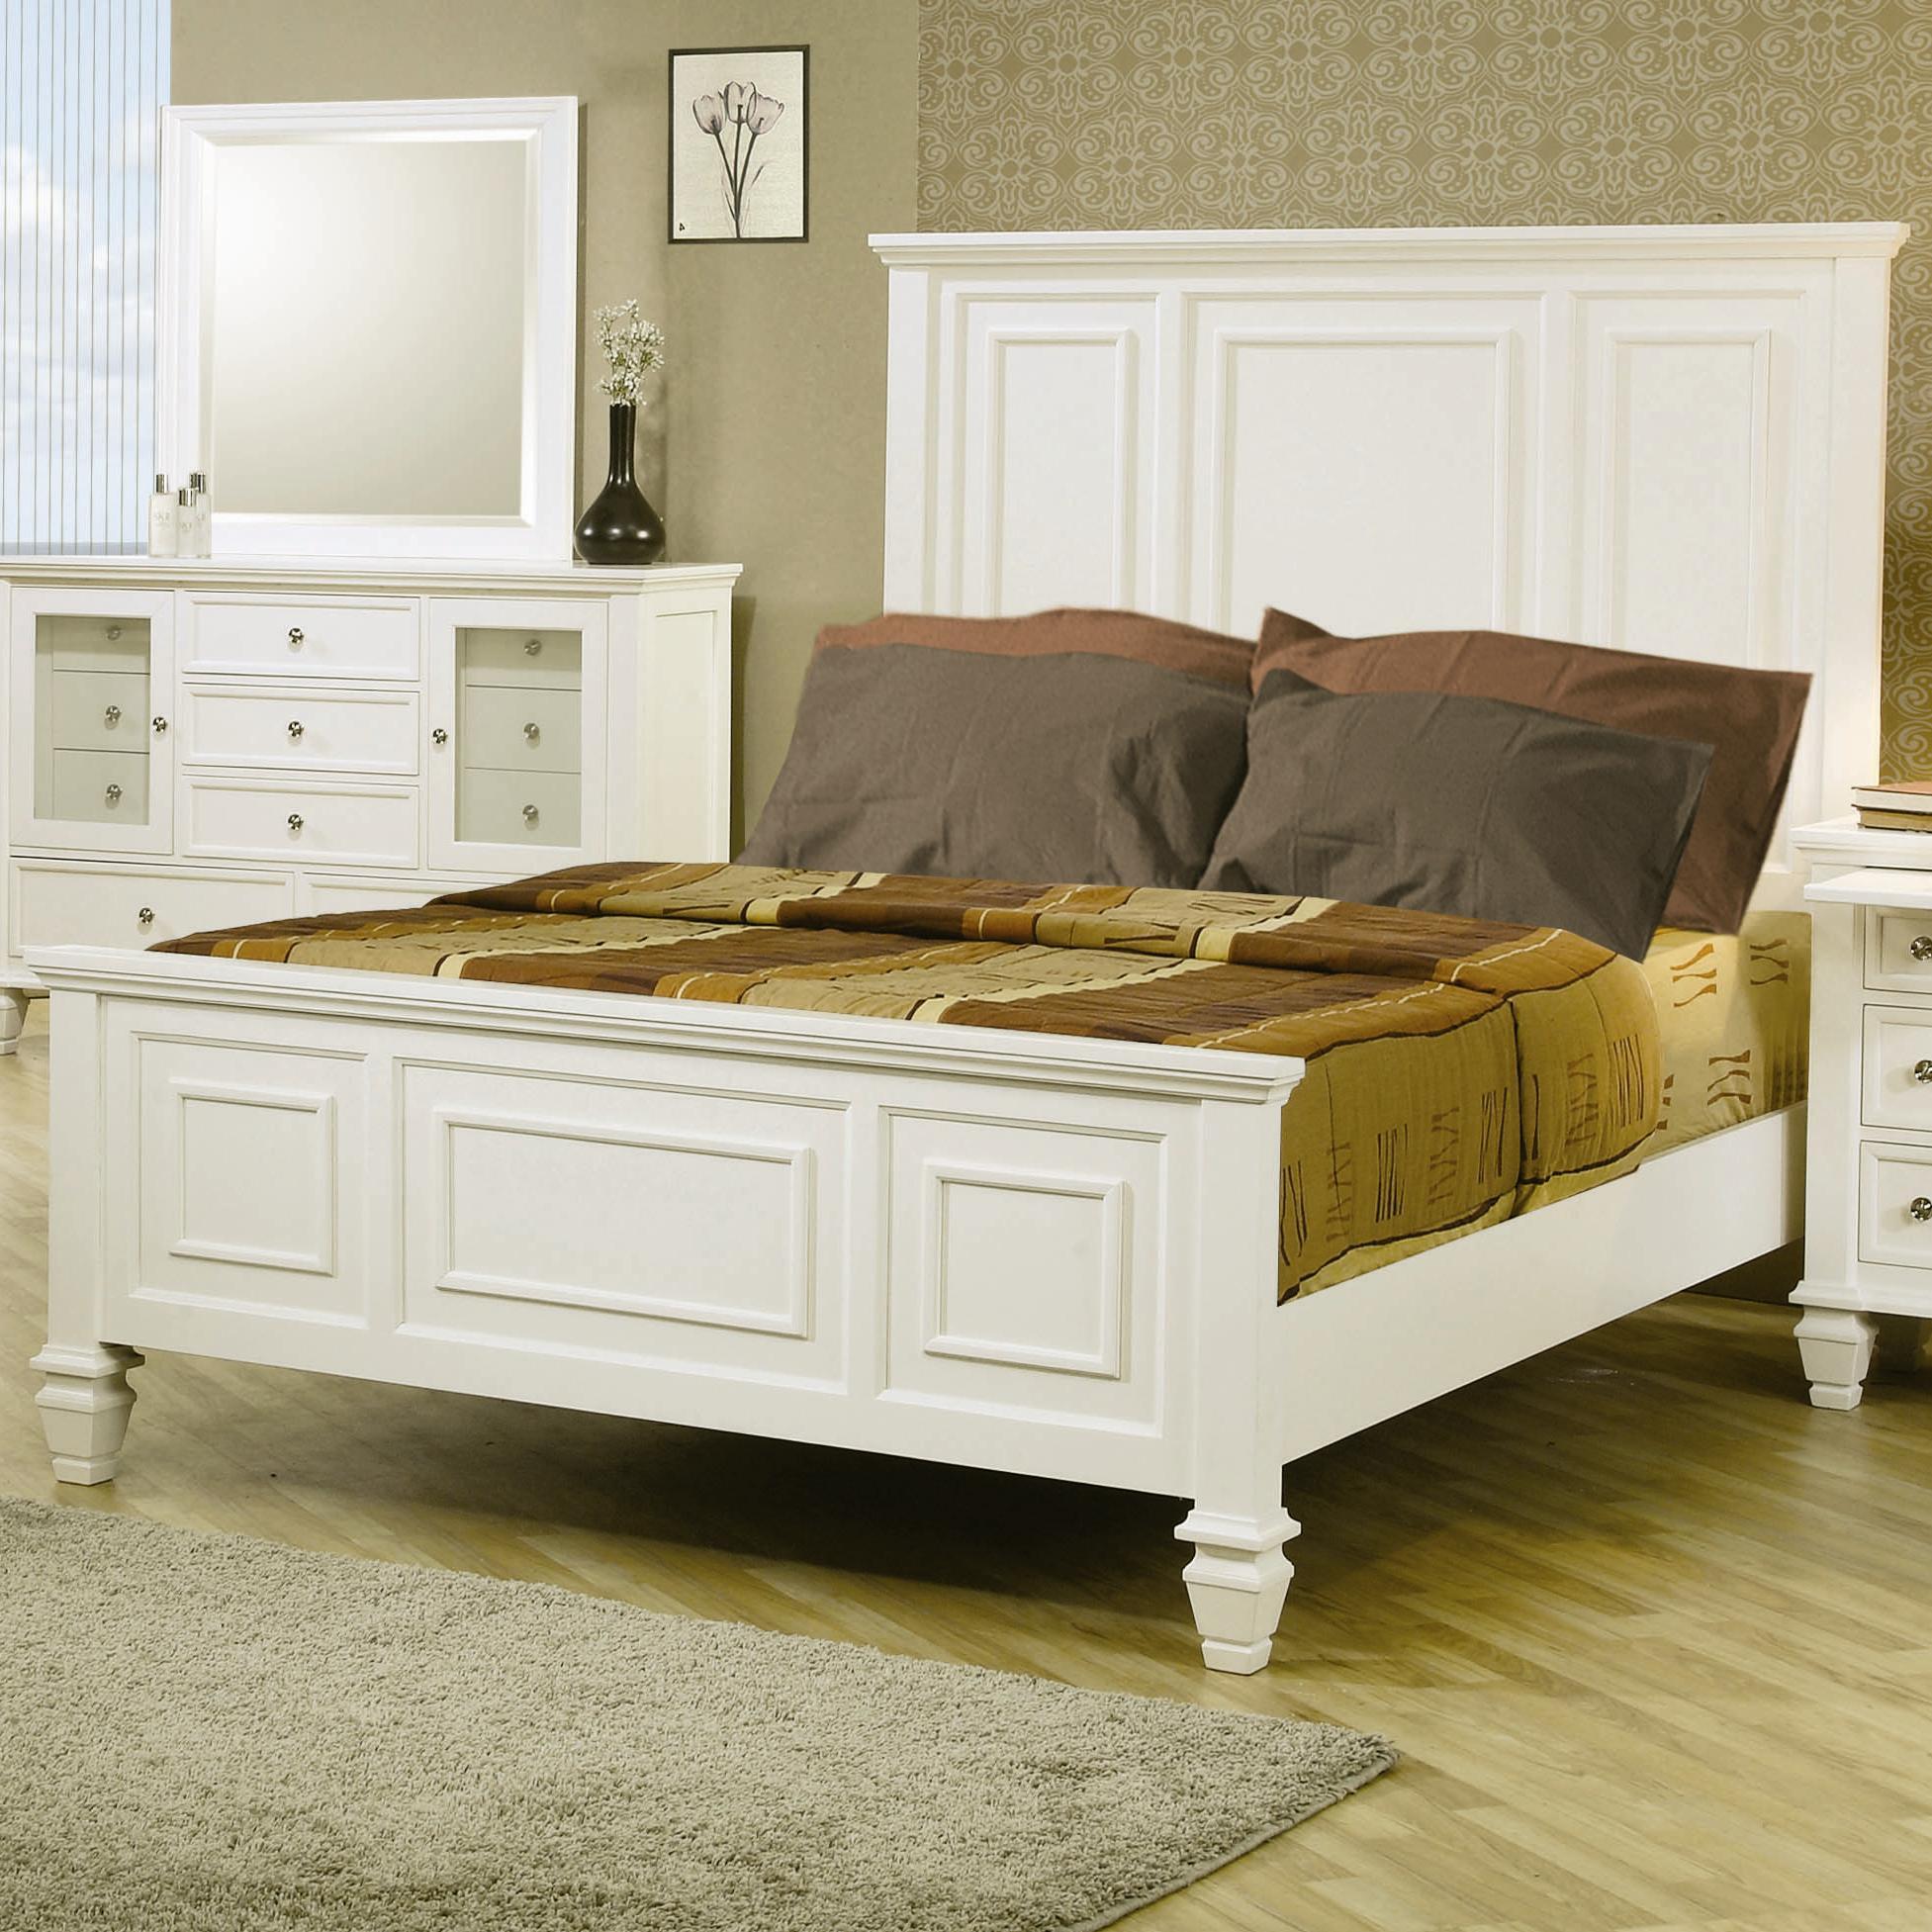 Classic King High Headboard Bed